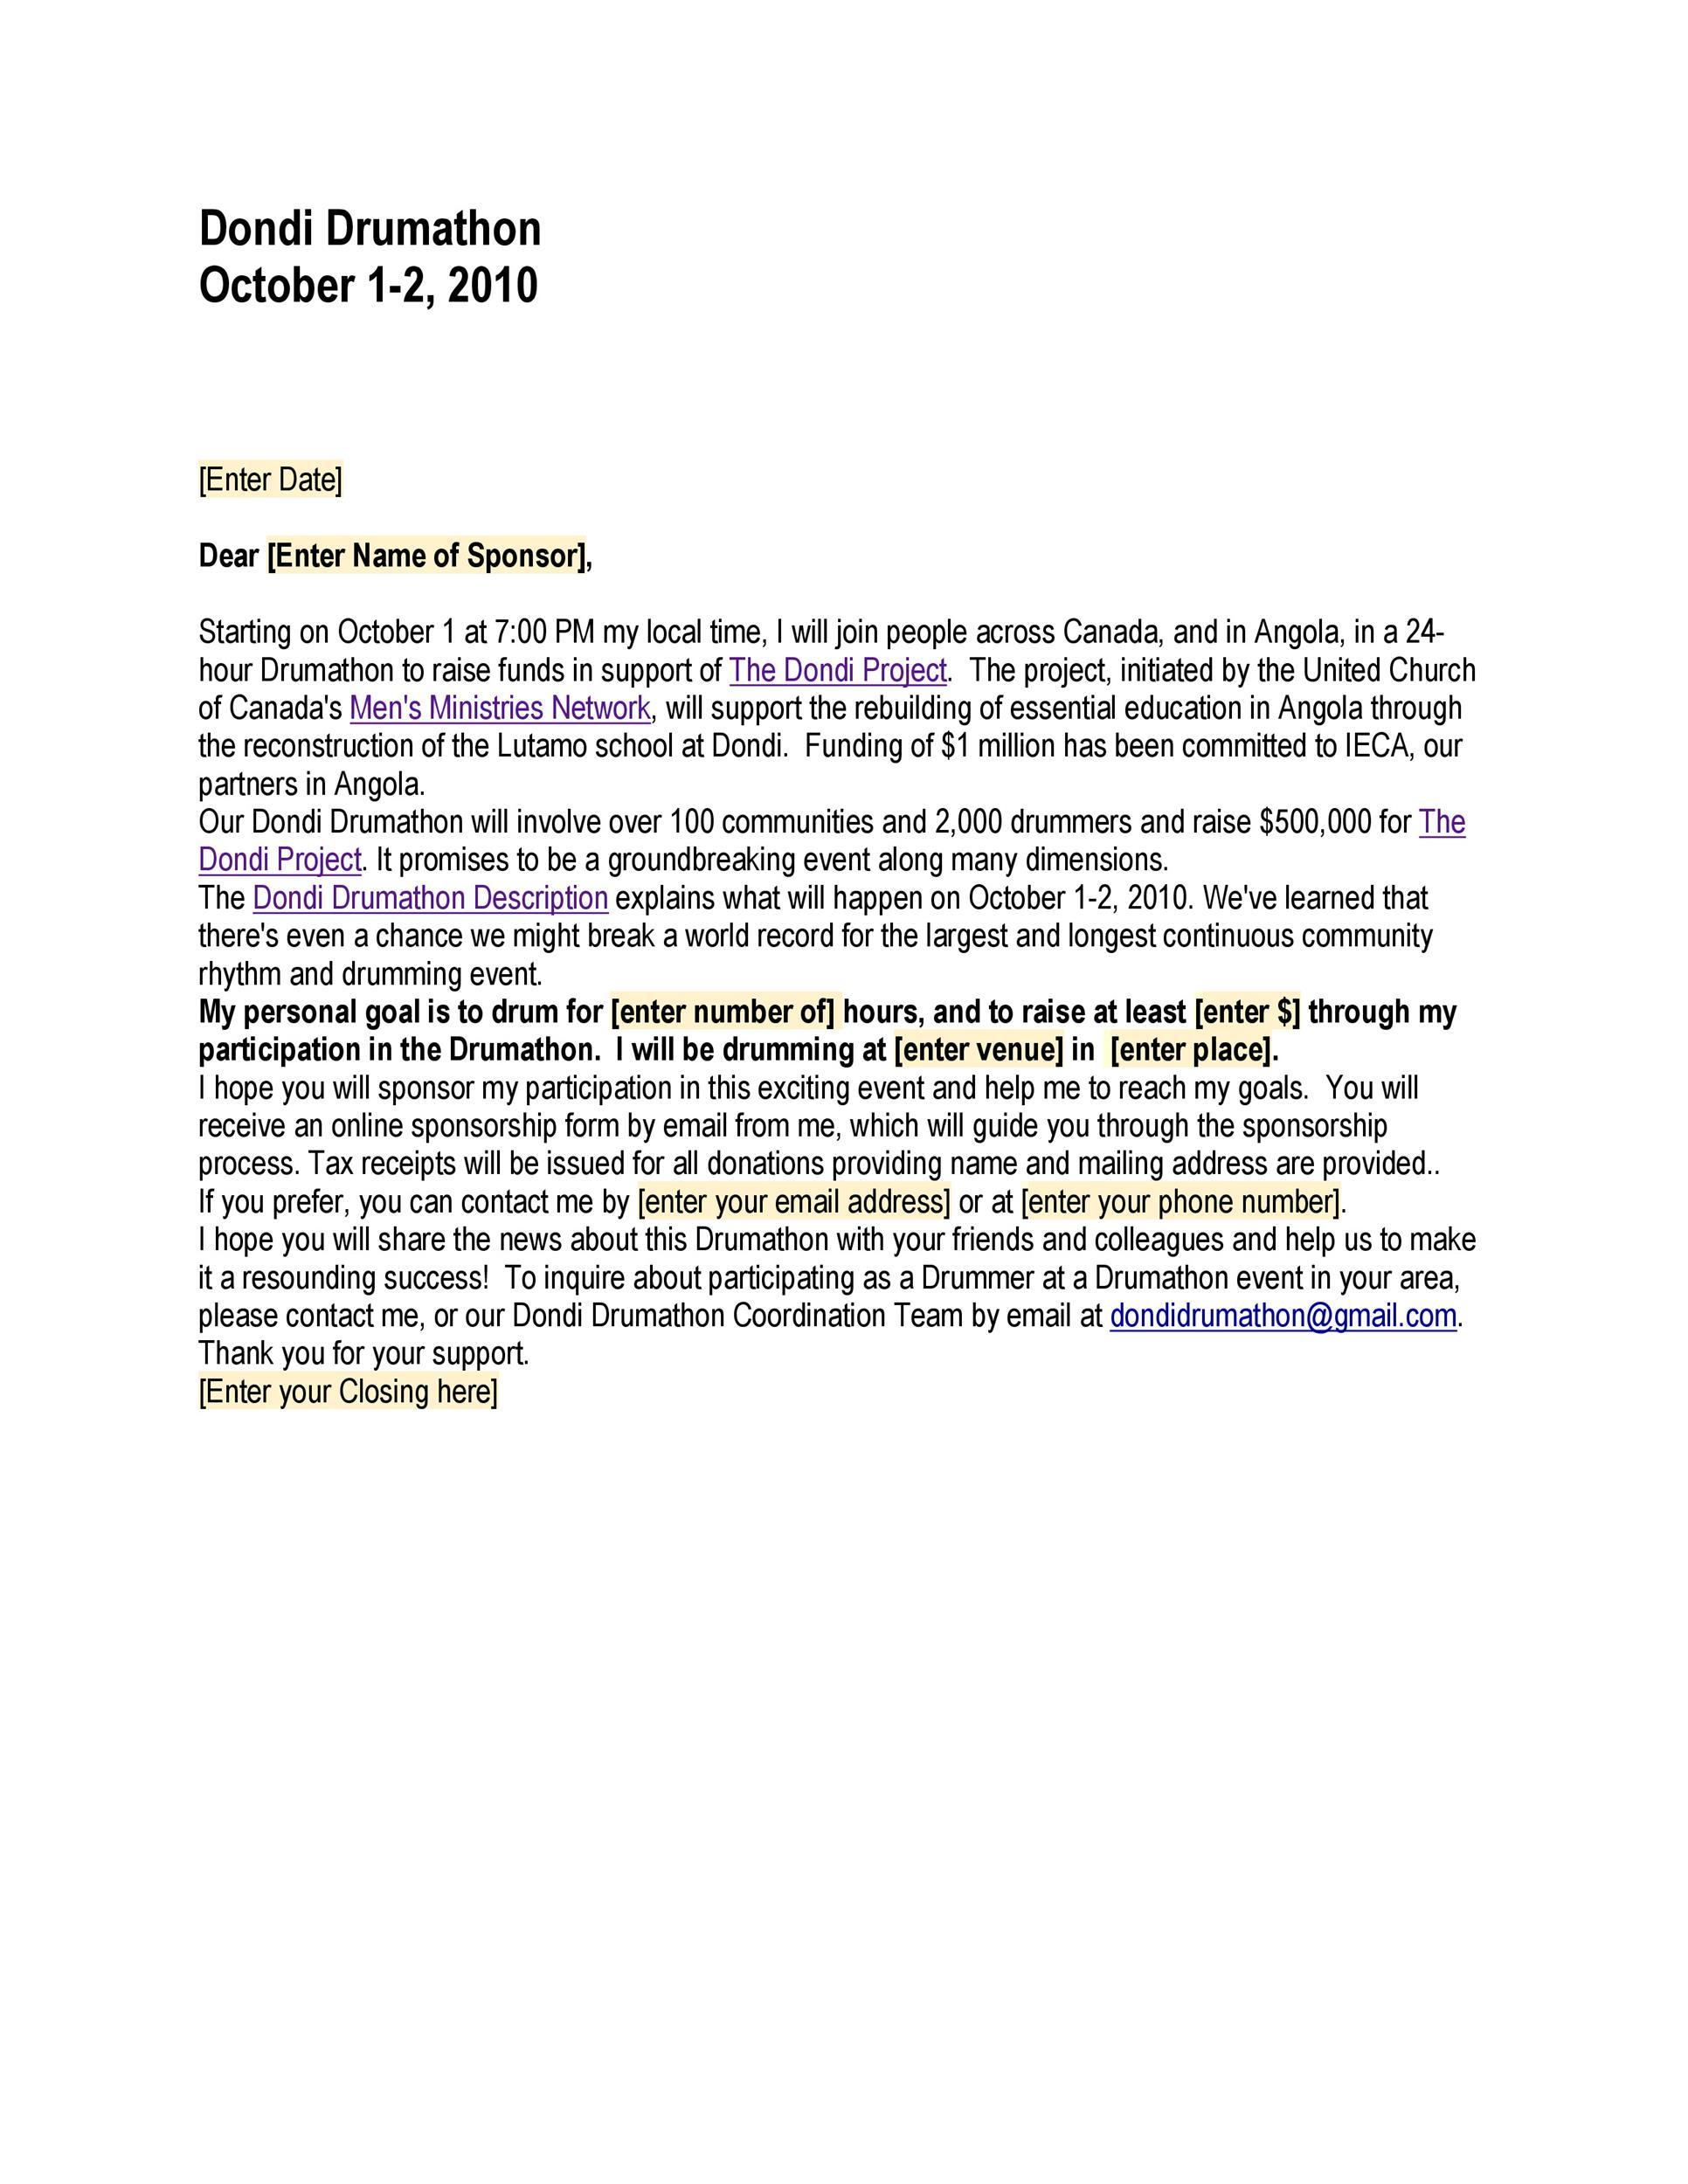 40+ Sponsorship Letter  Sponsorship Proposal Templates - sponsorship proposal template